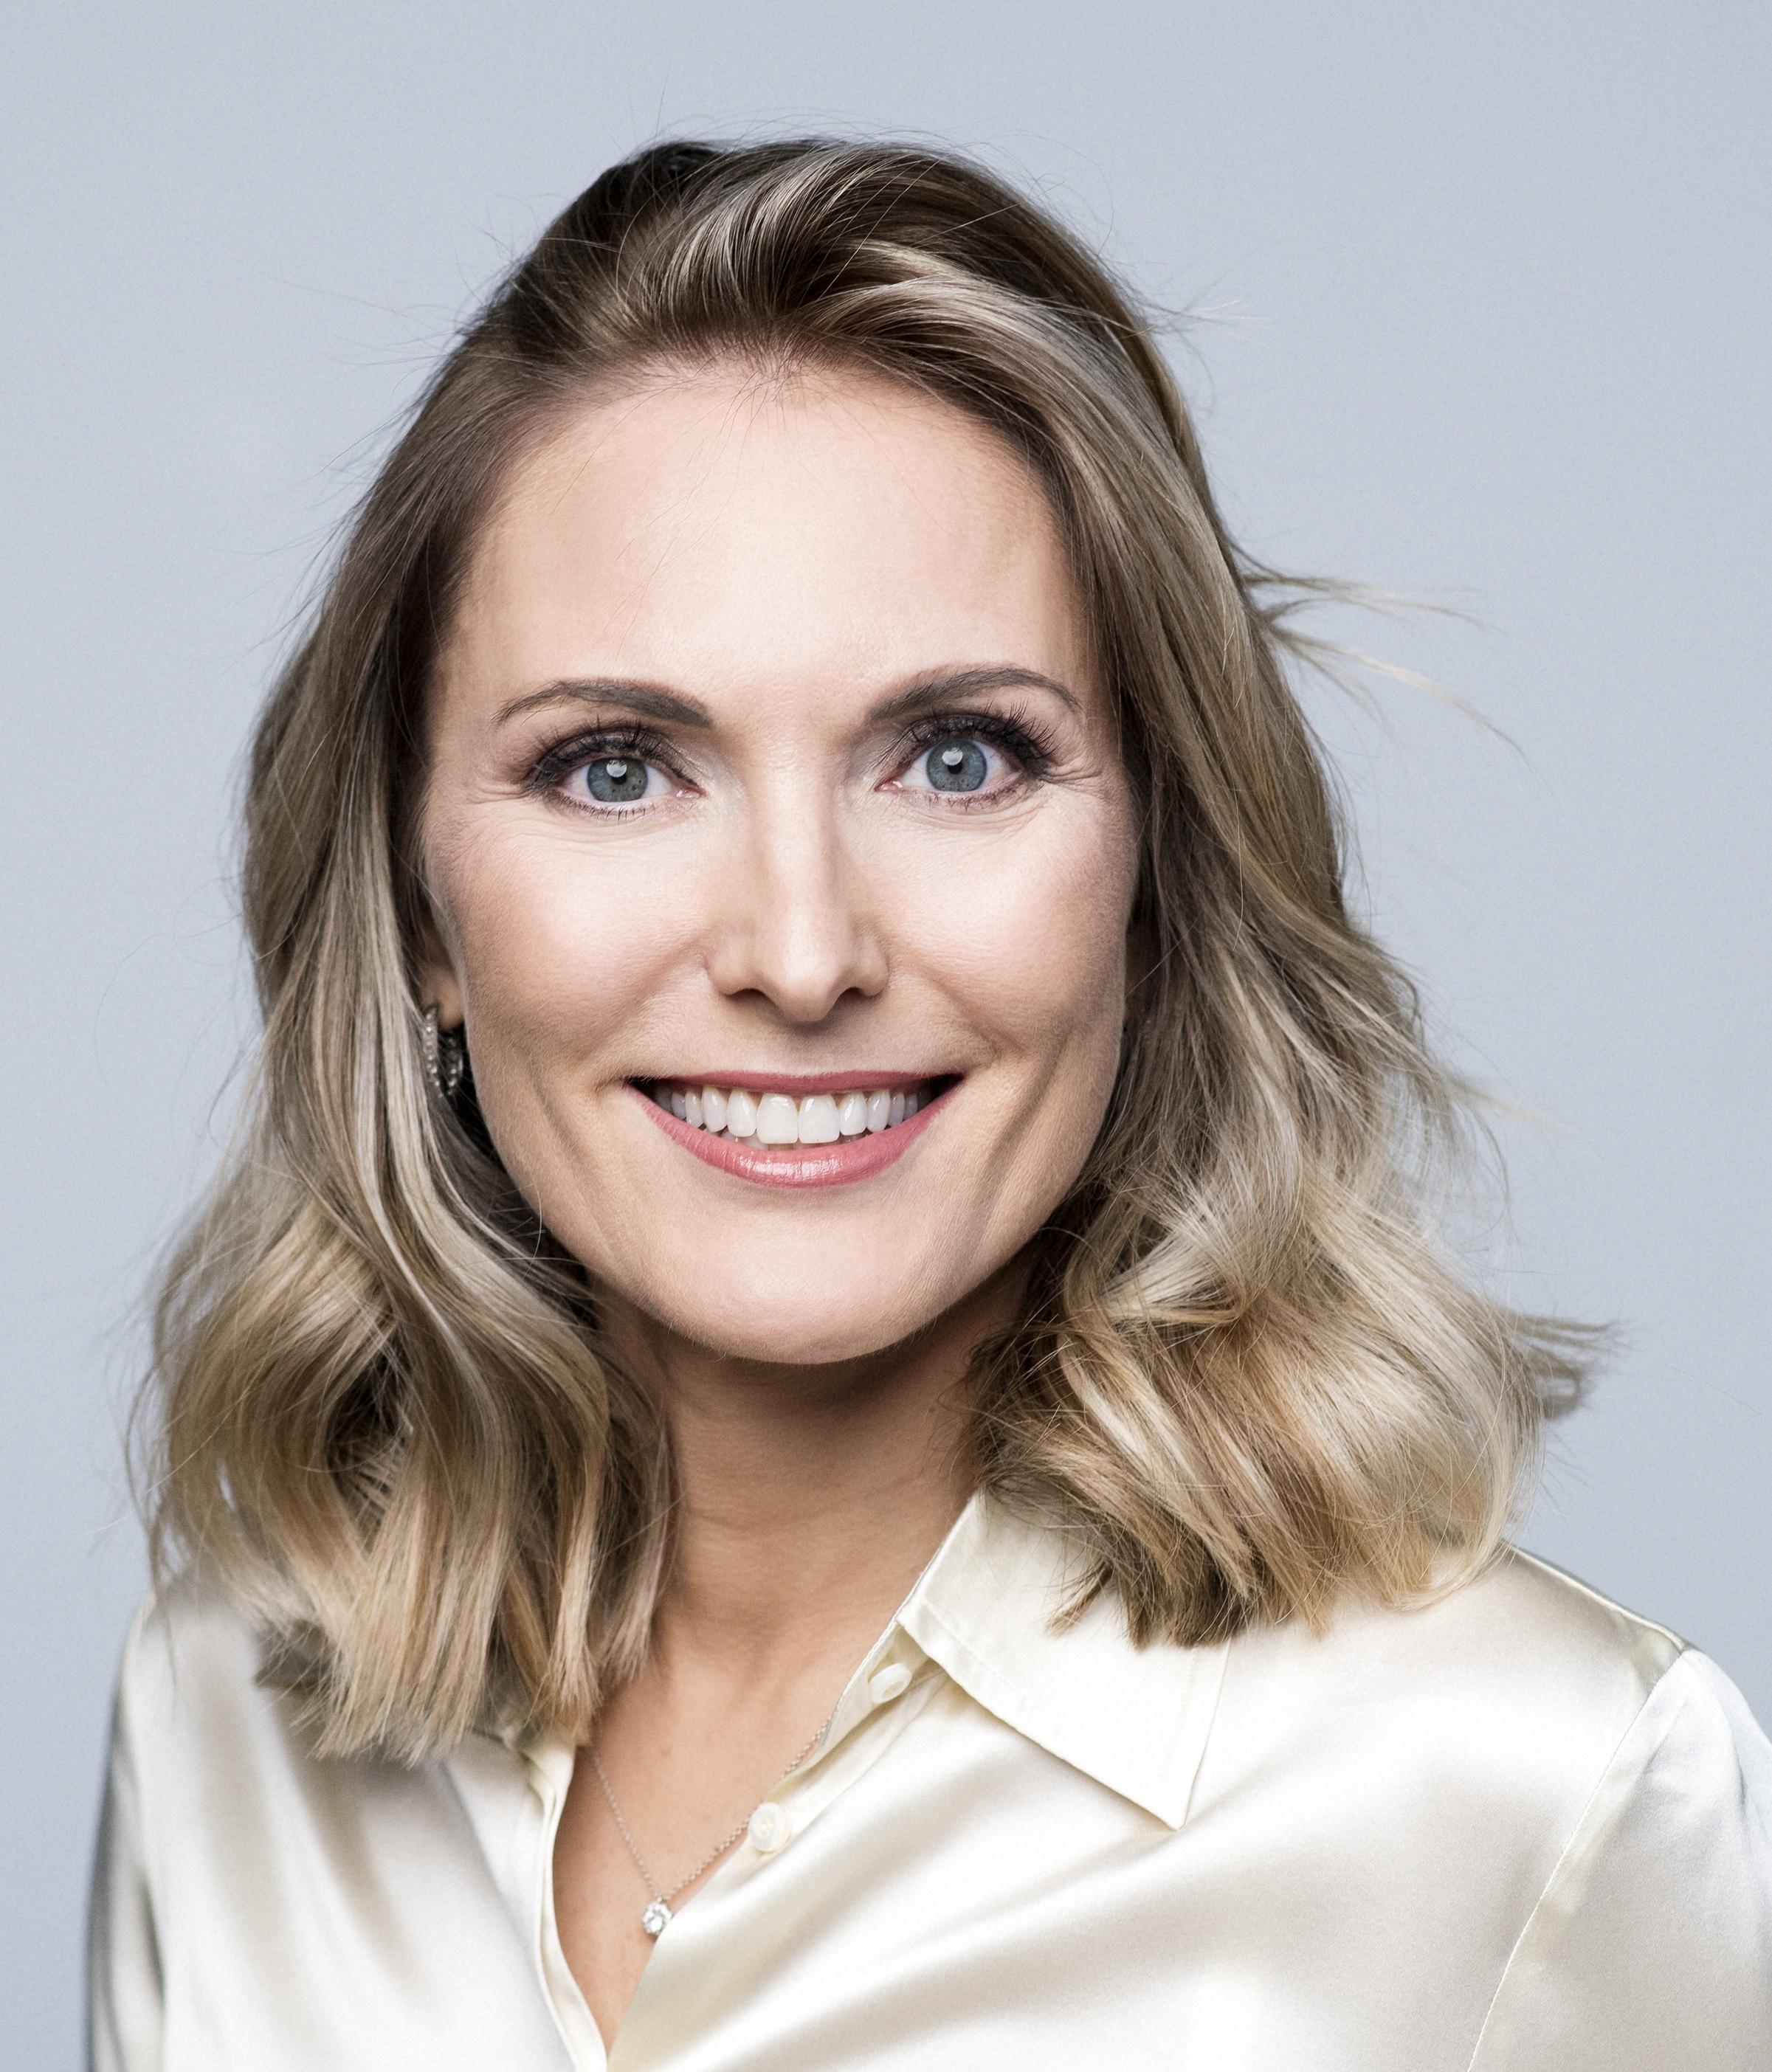 Kristina Marciuleviciene